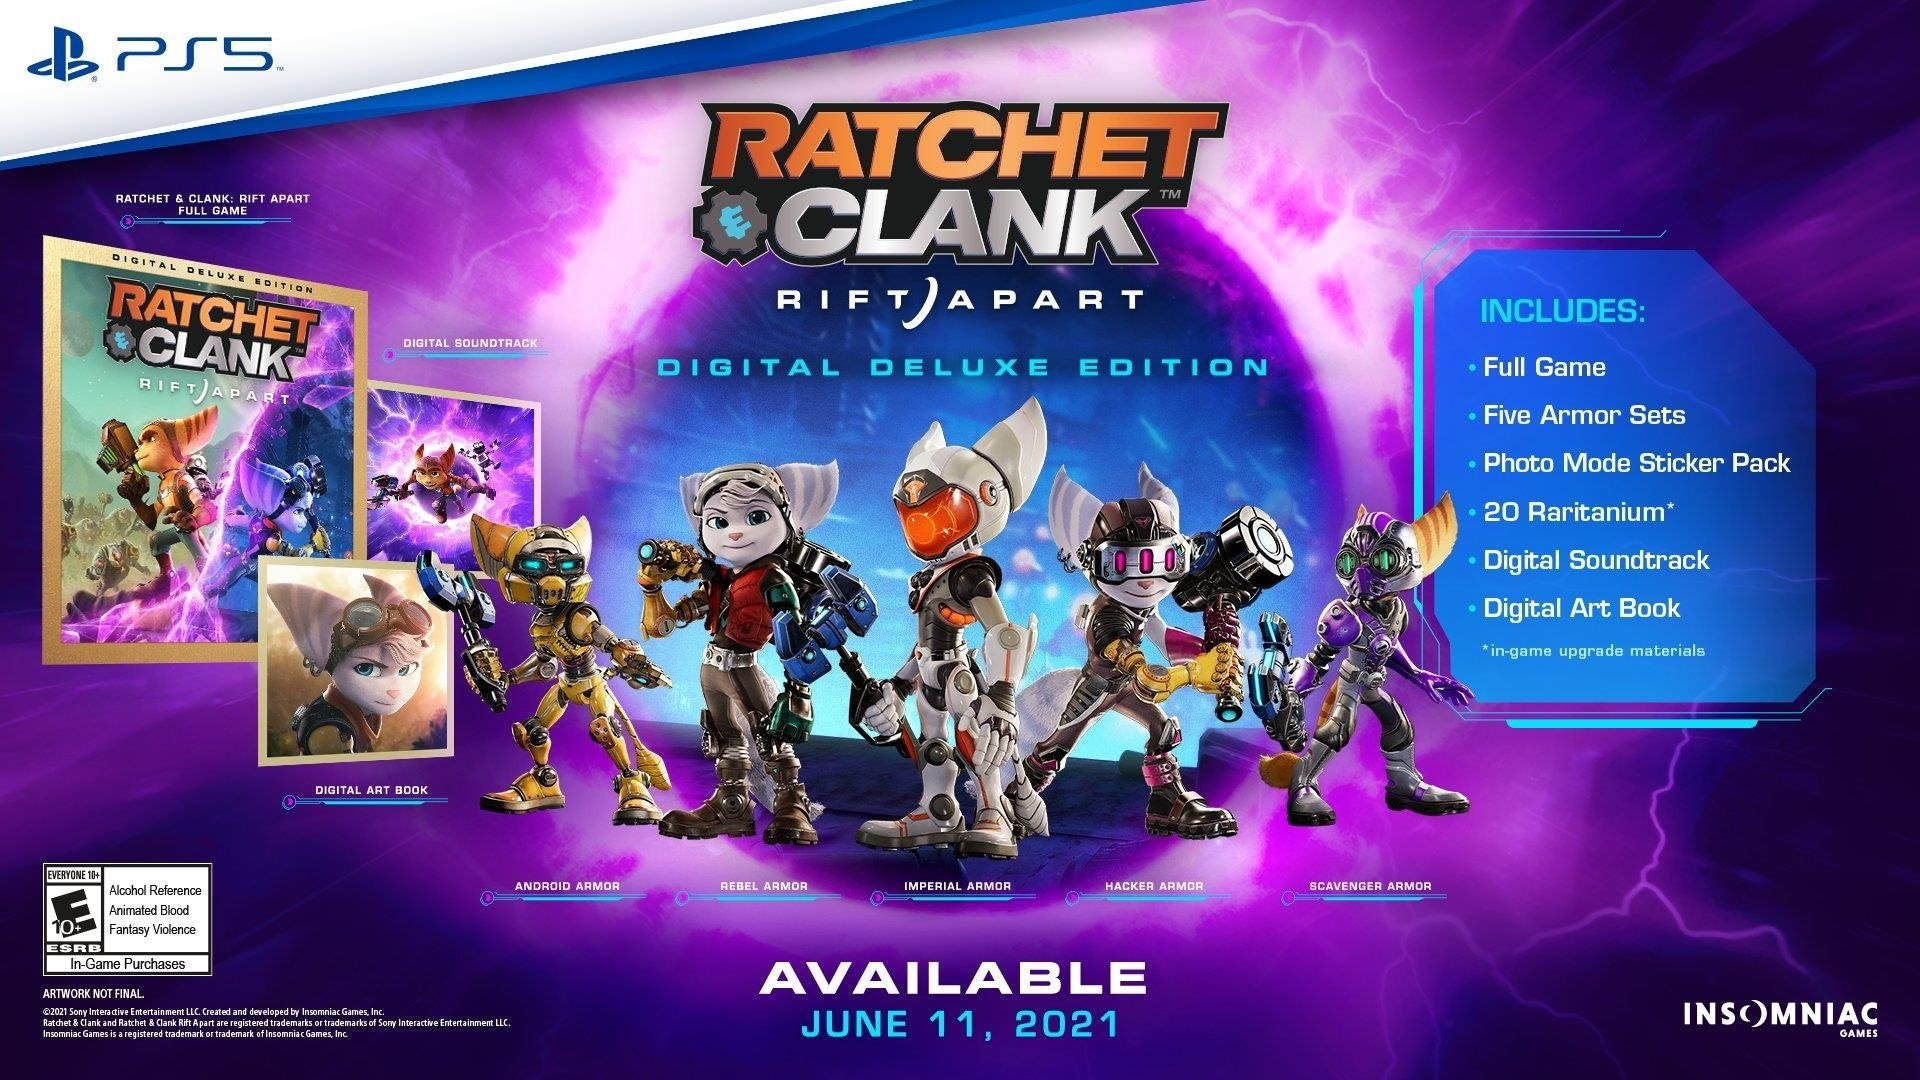 Ratchet & Clank: Rift Apart Digital Deluxe Edition